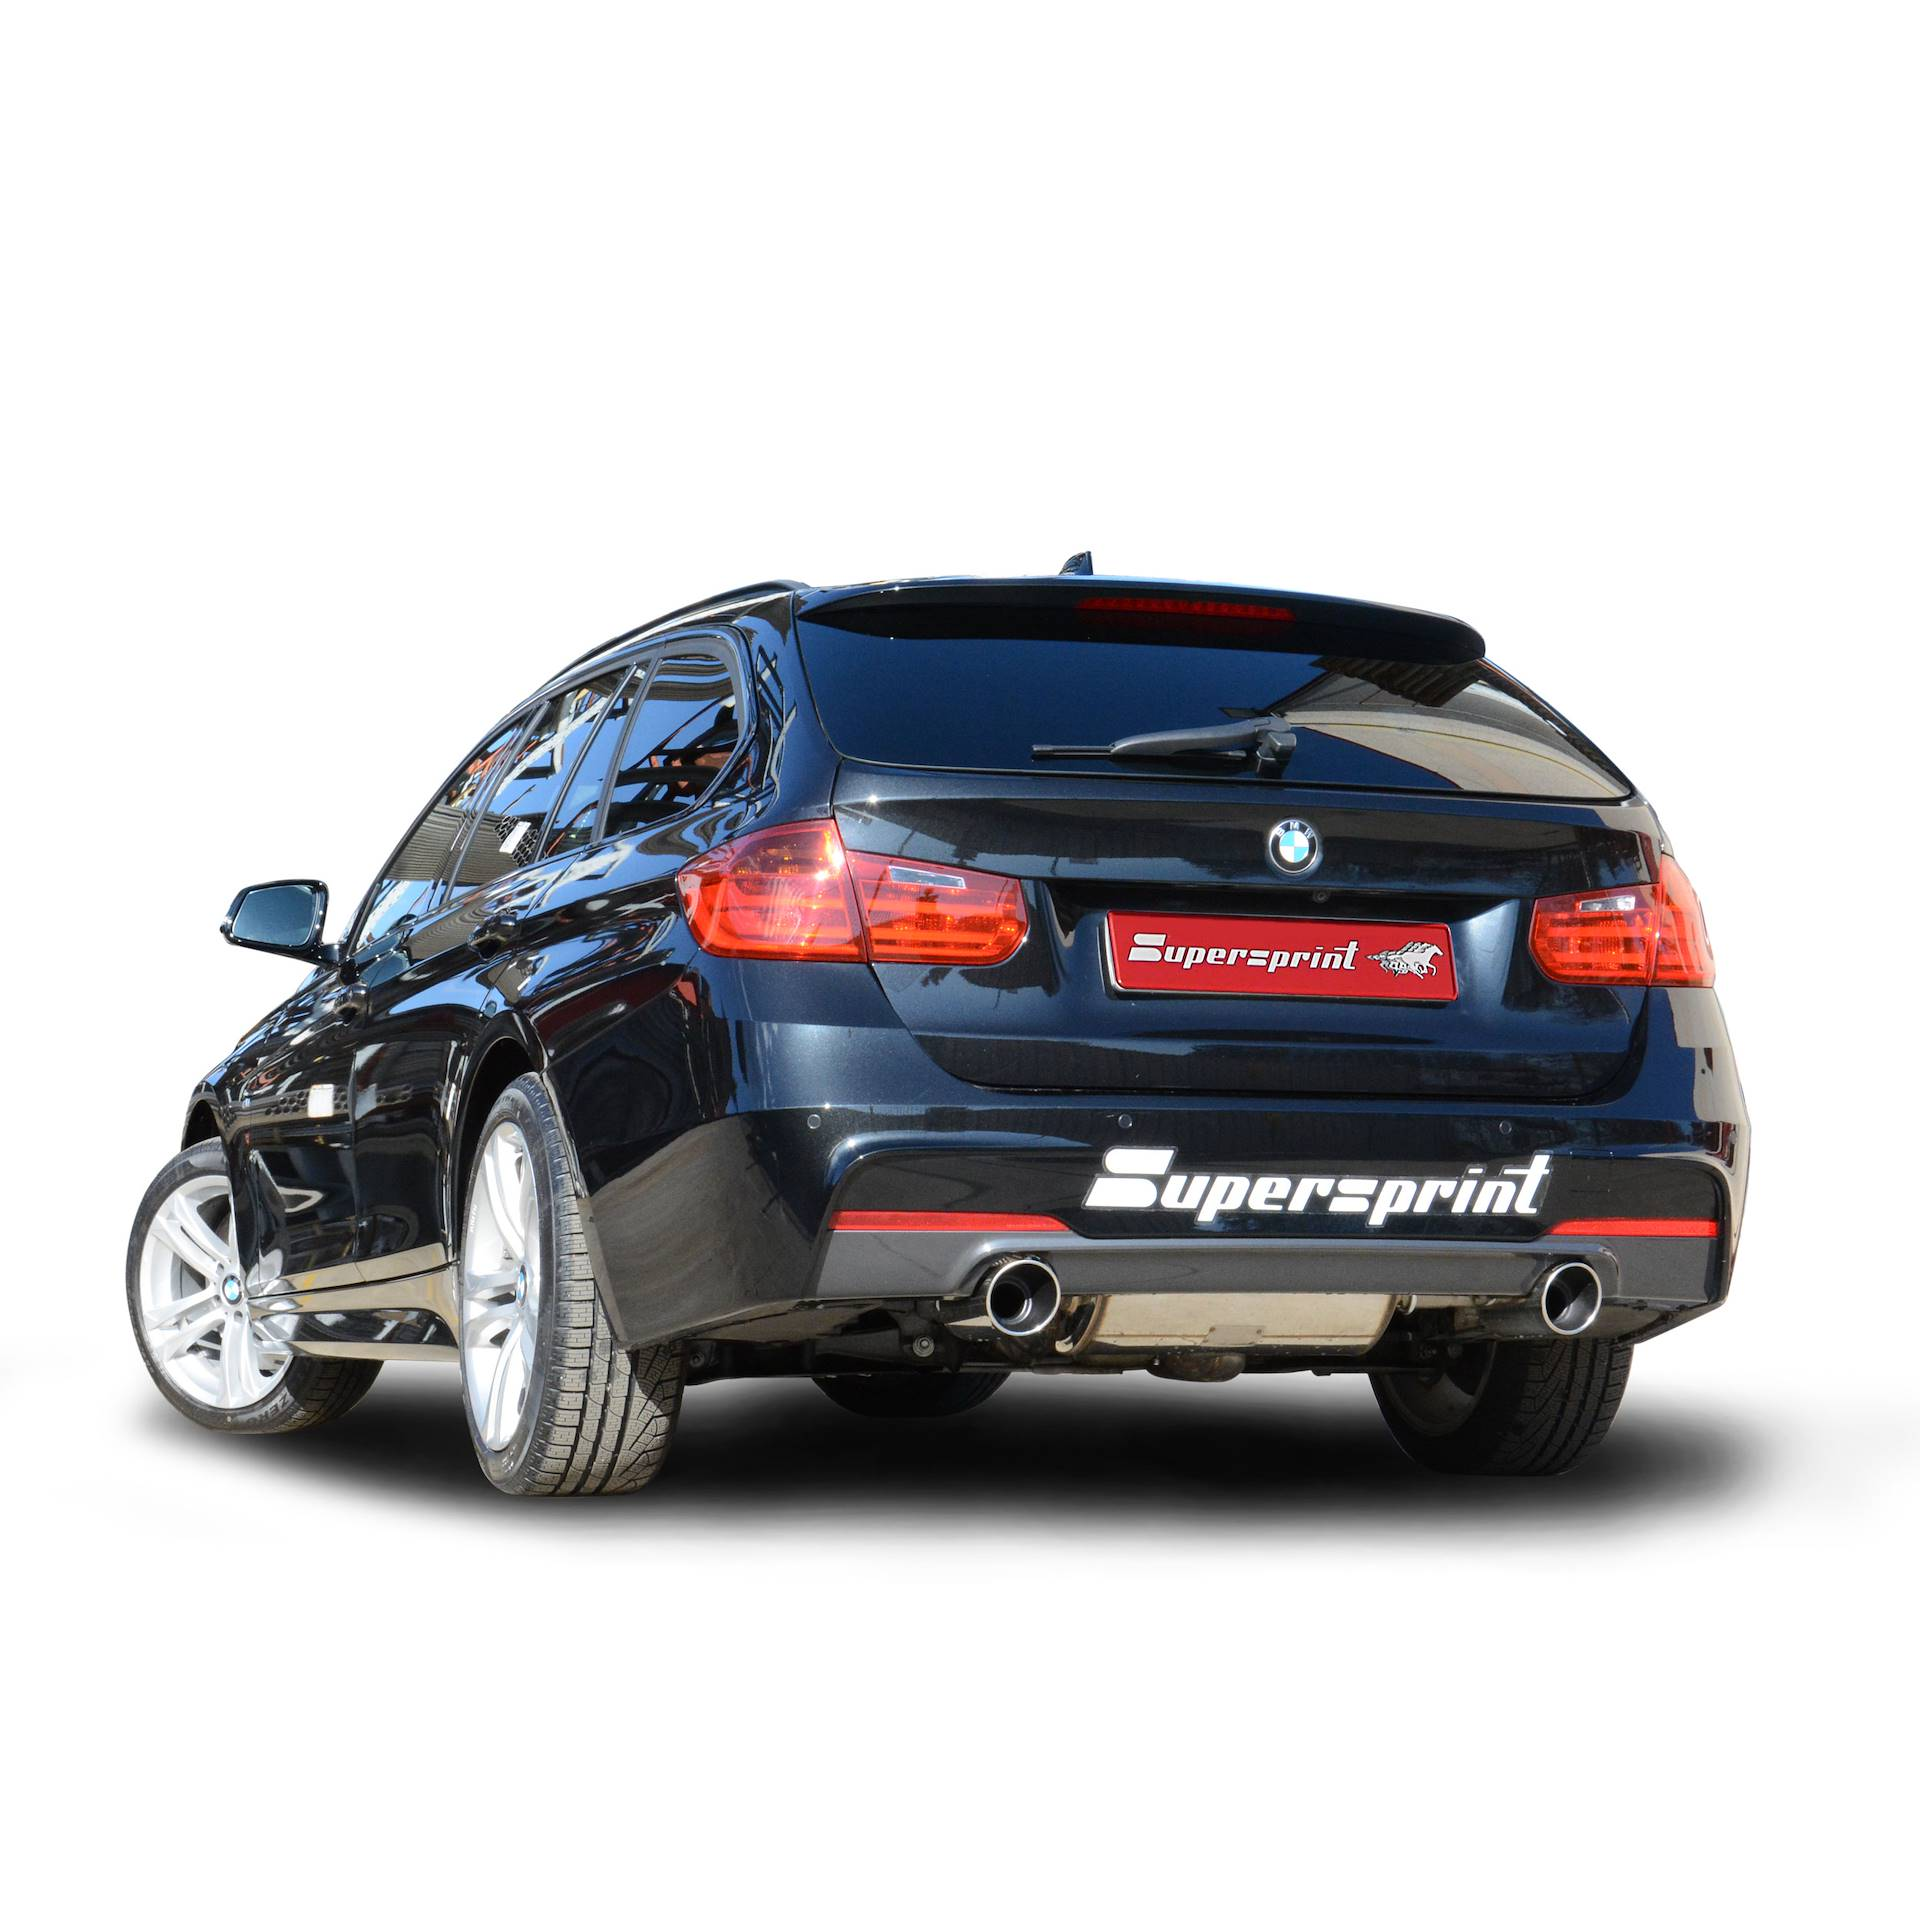 Bmw Xdrive 335d: BMW F31 (Touring) 328iX 2.0T (N20 245Hp) 2012 -> 2015, BMW